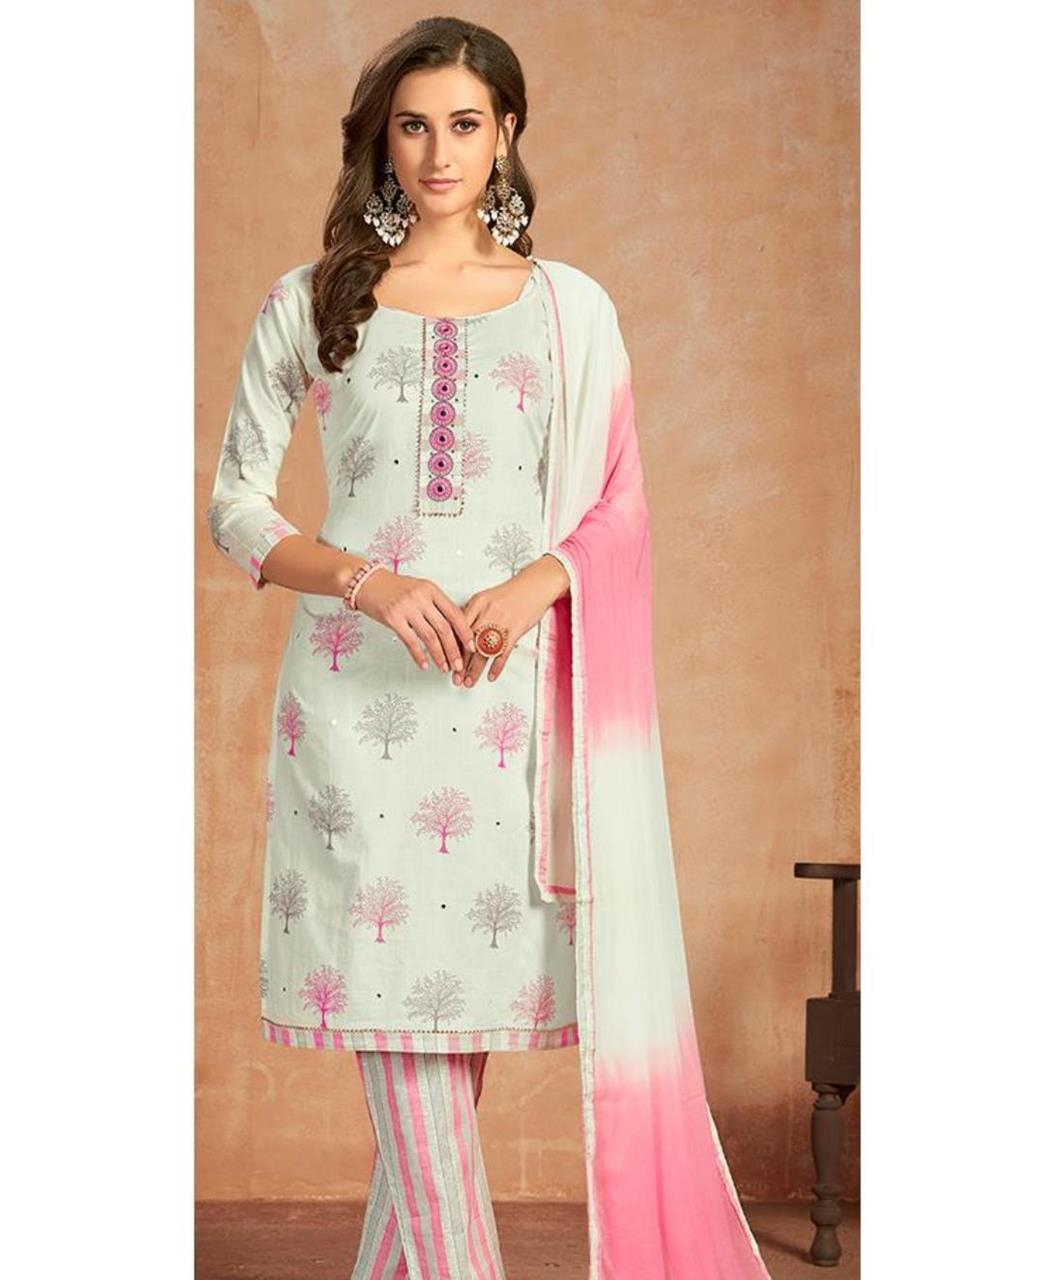 Printed Cotton Straight cut Salwar Kameez in Off White